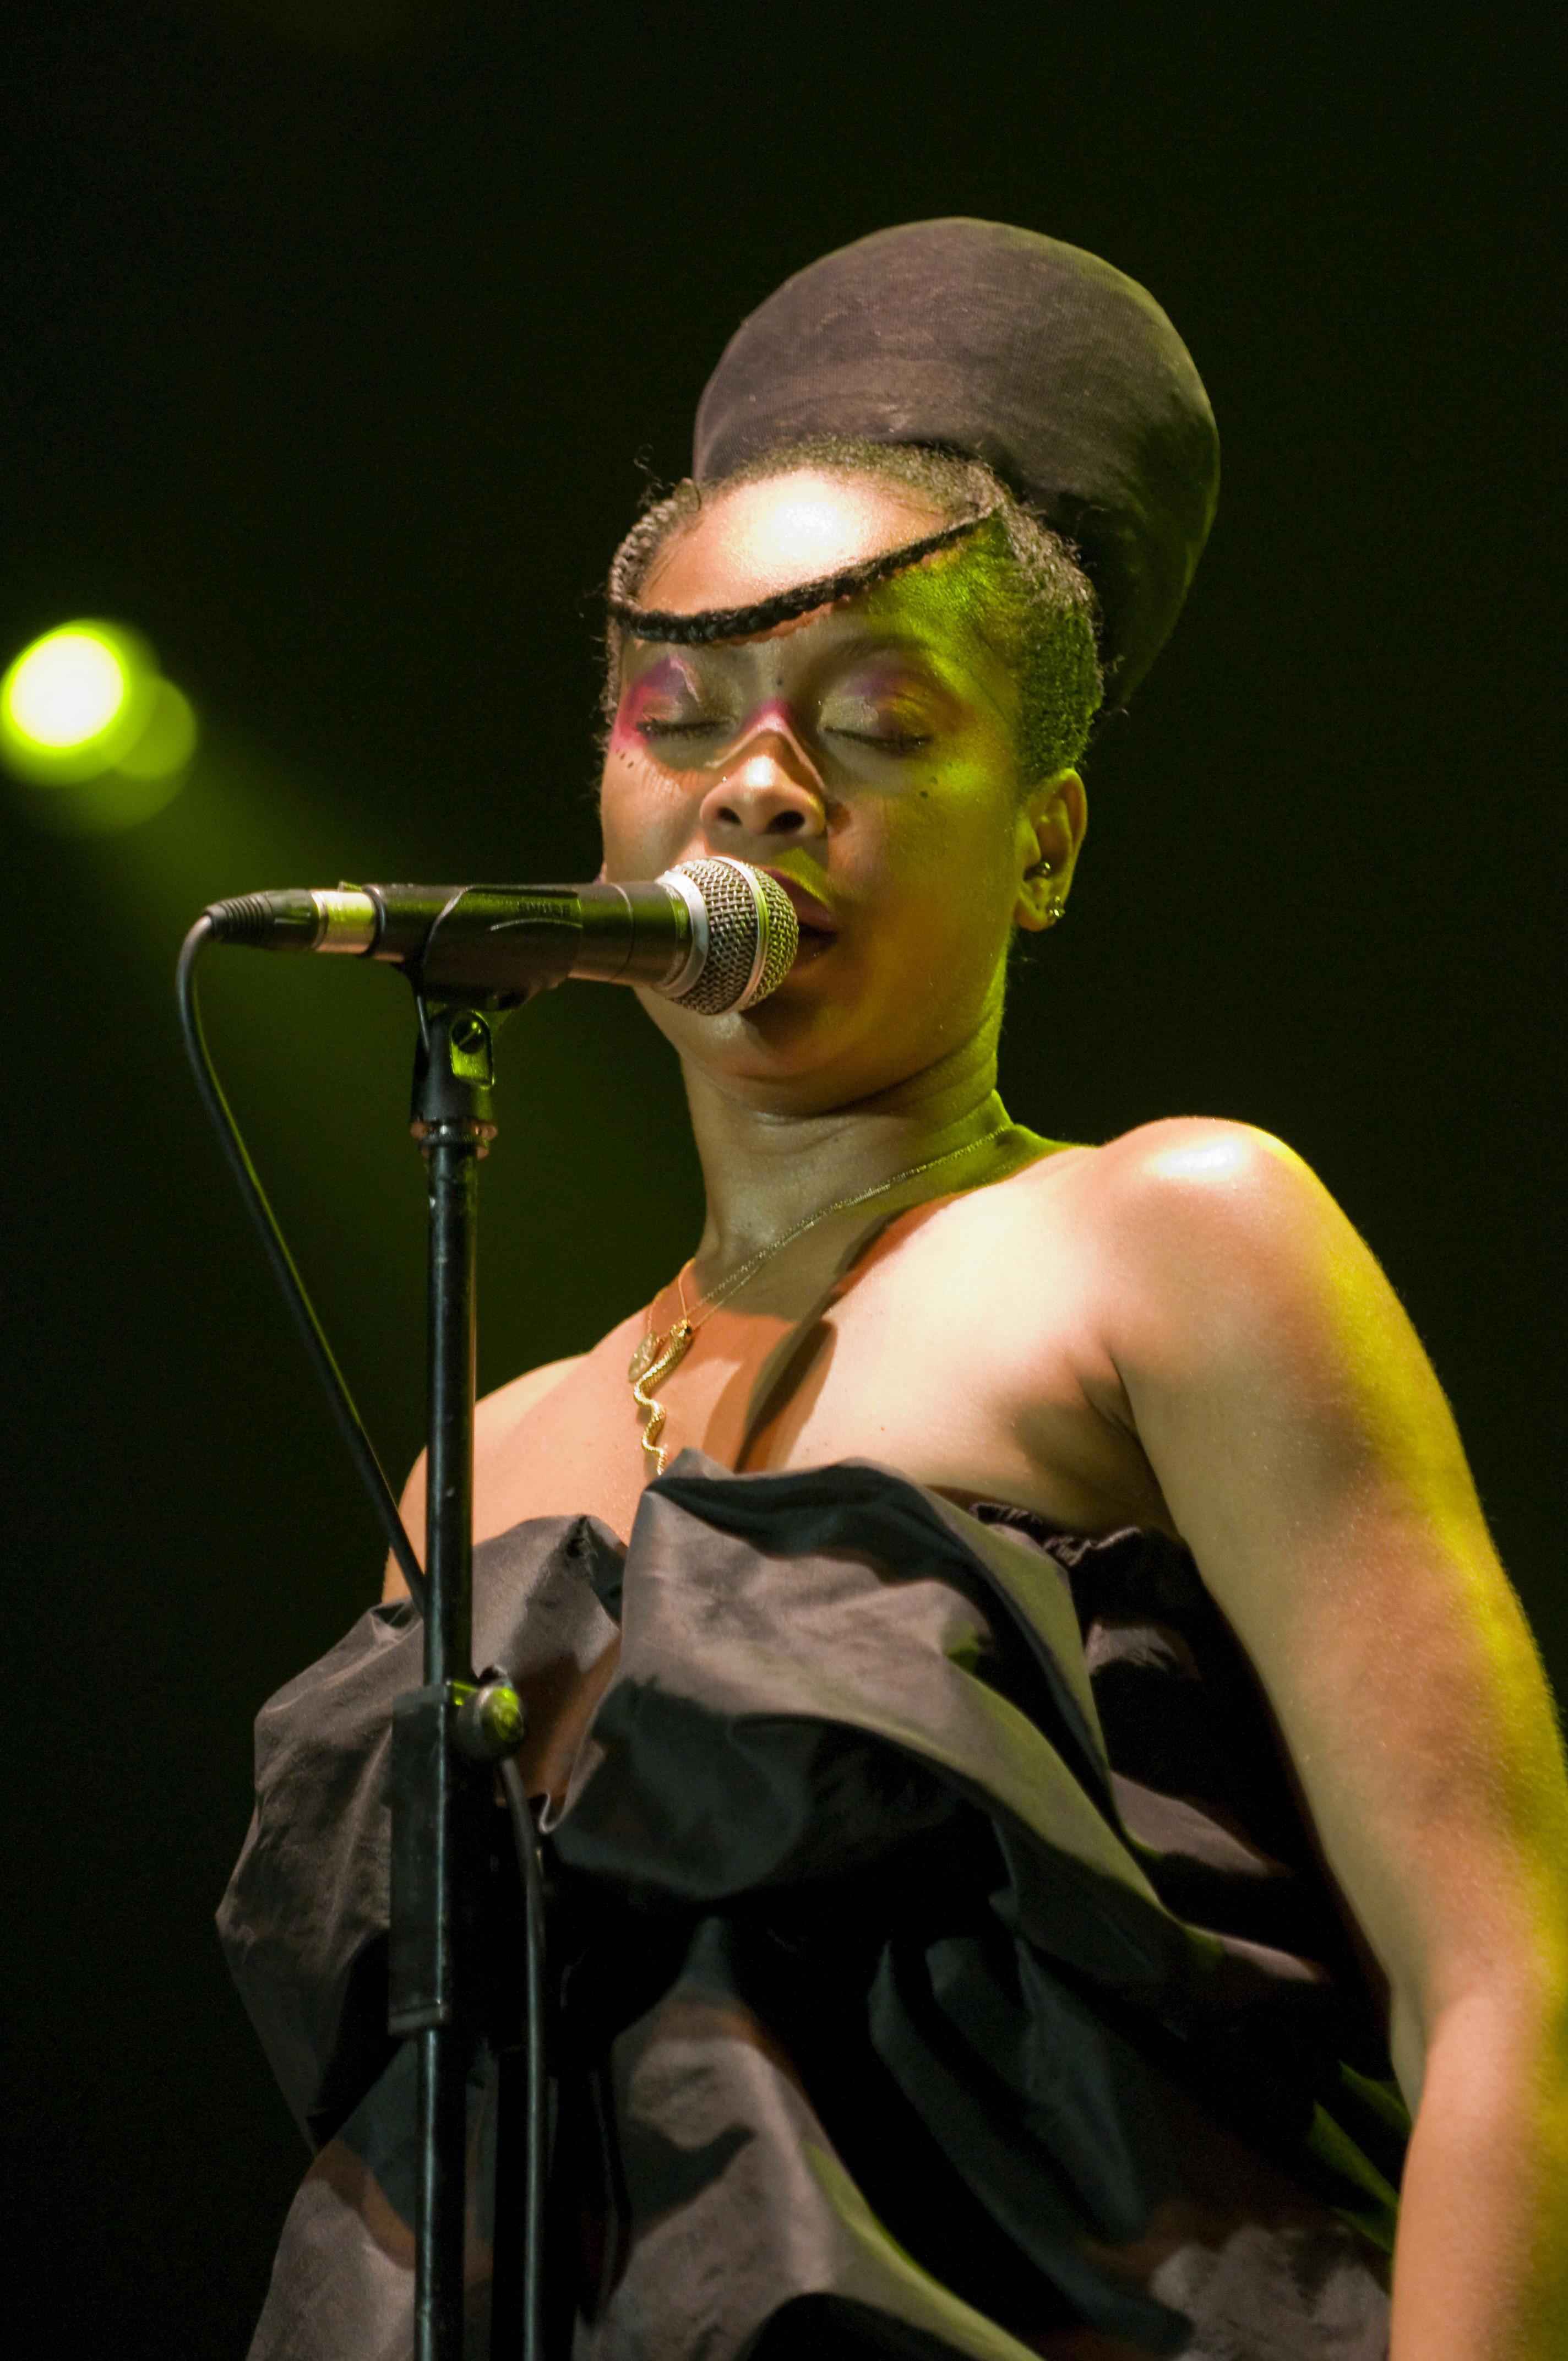 Erykah Badu - On & On (Dance Mix)